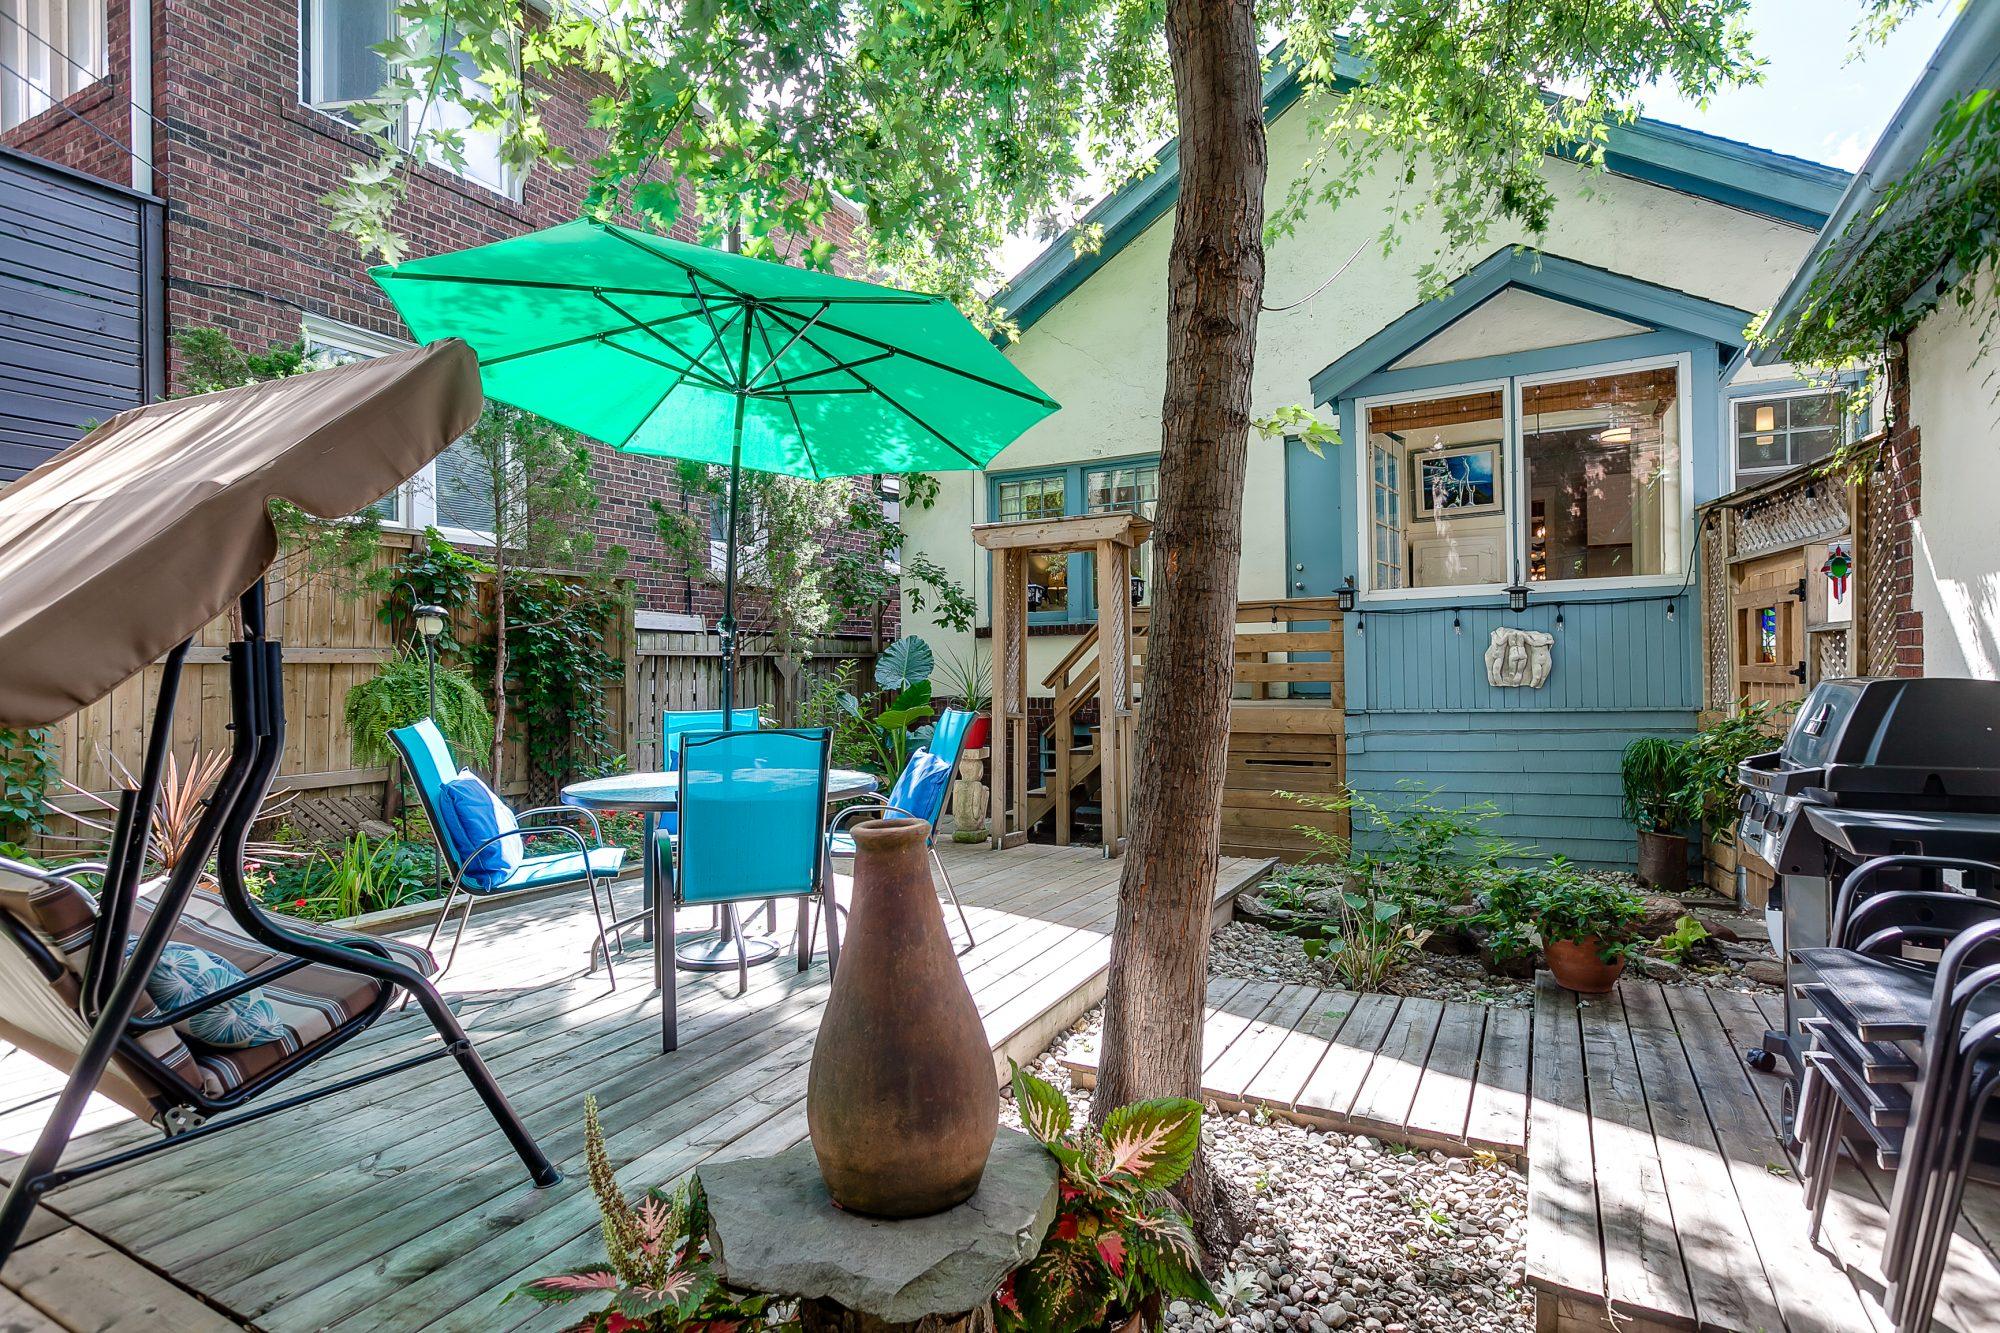 toronto-house-for-sale-8-glenavon-road-12